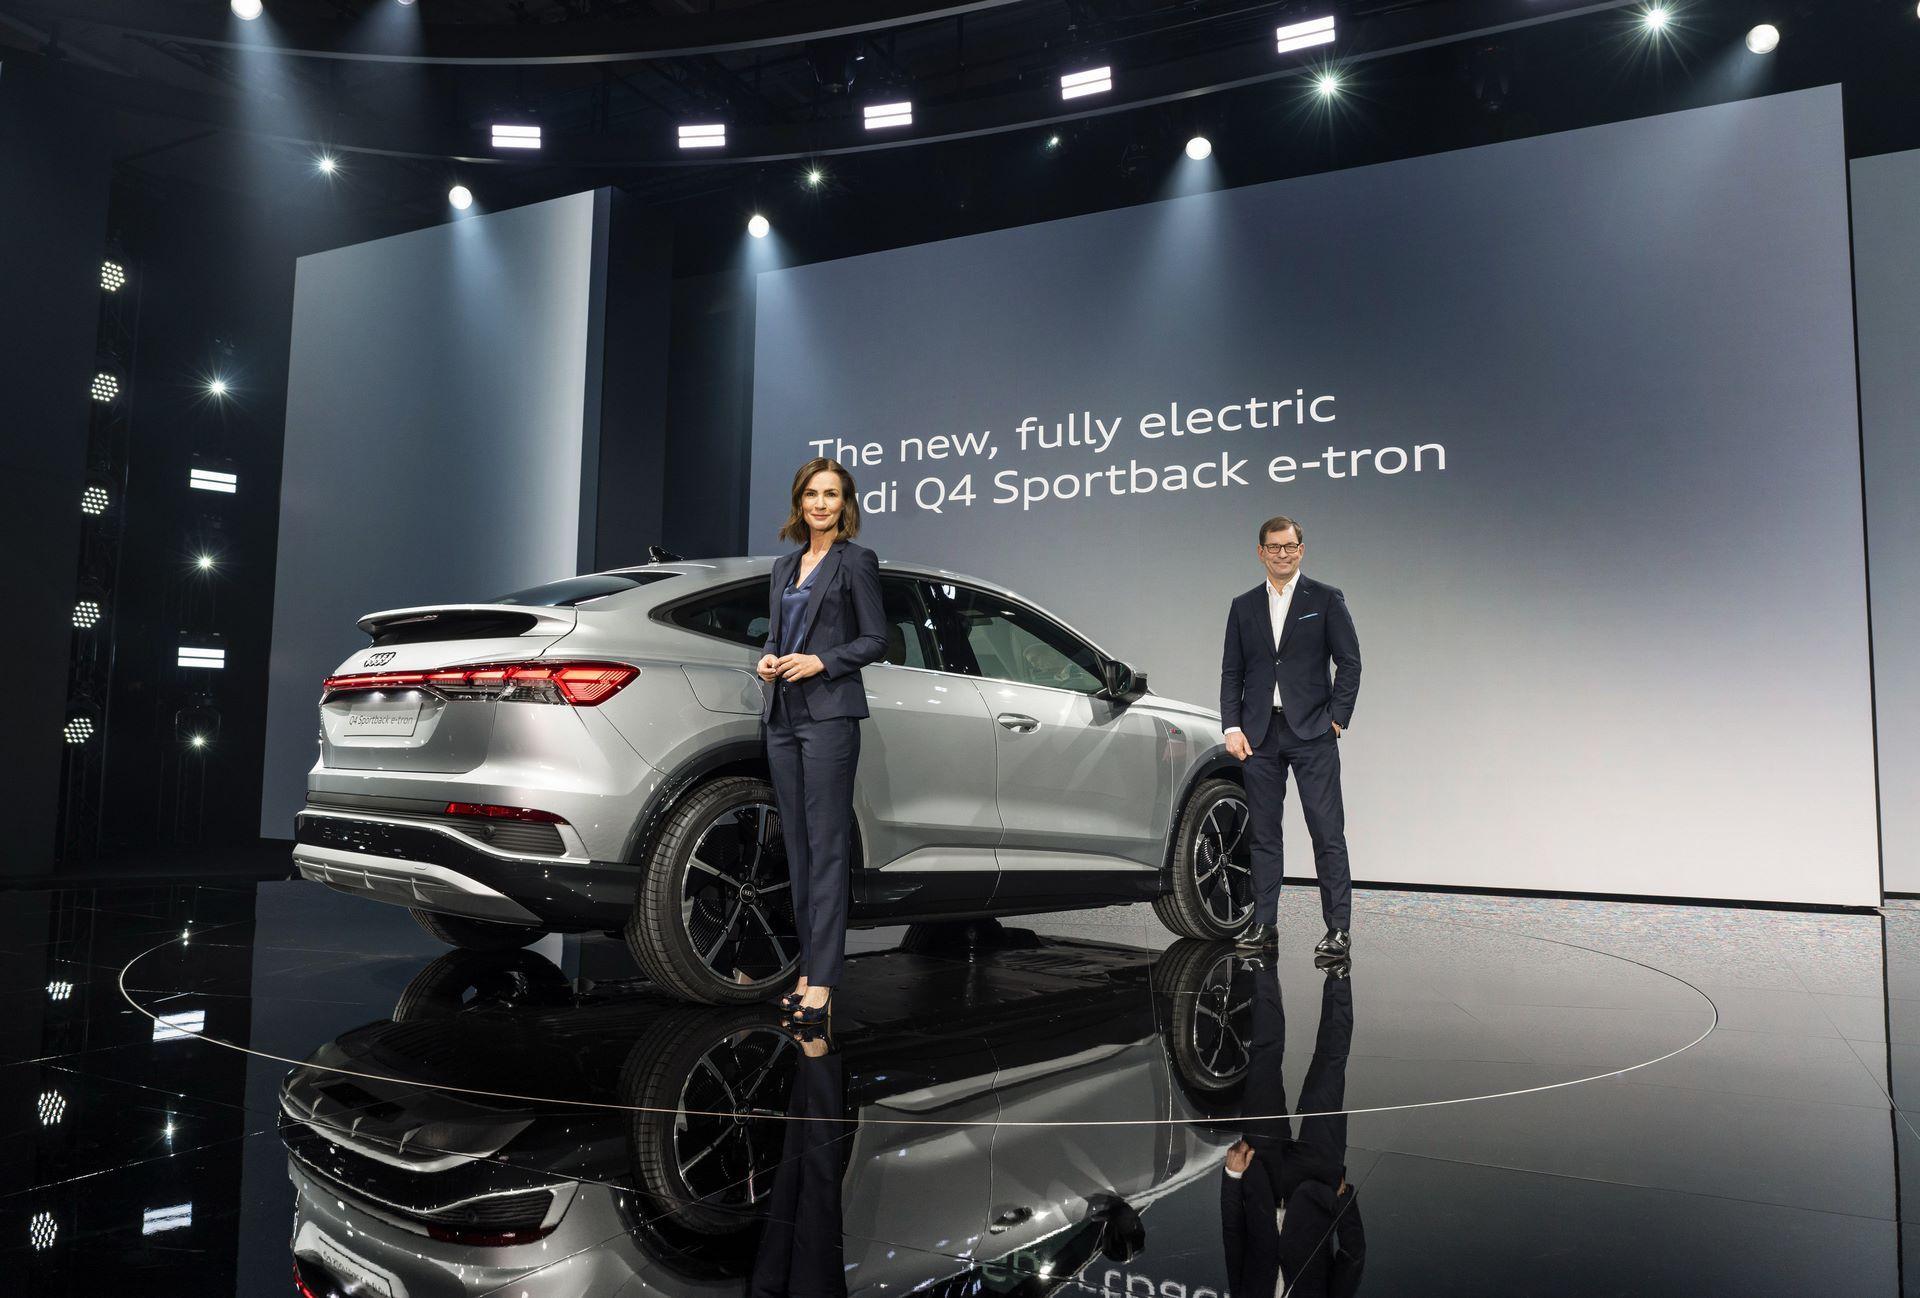 Audi-Q4-e-tron-and-Q4-e-tron-Sportback-4